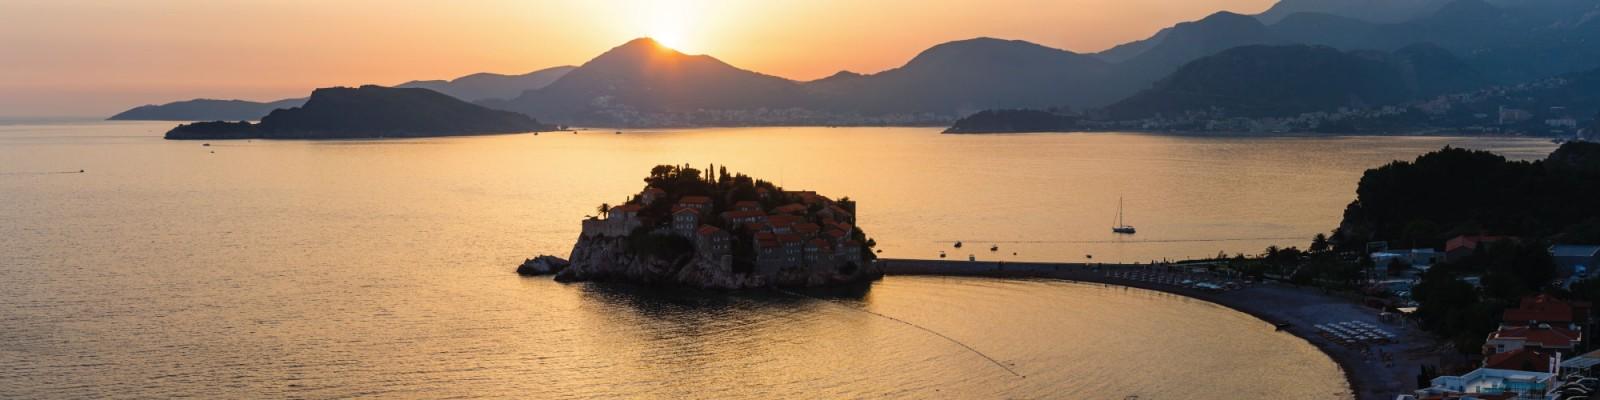 Tenrag Yacht Charter: Montenegro Bay